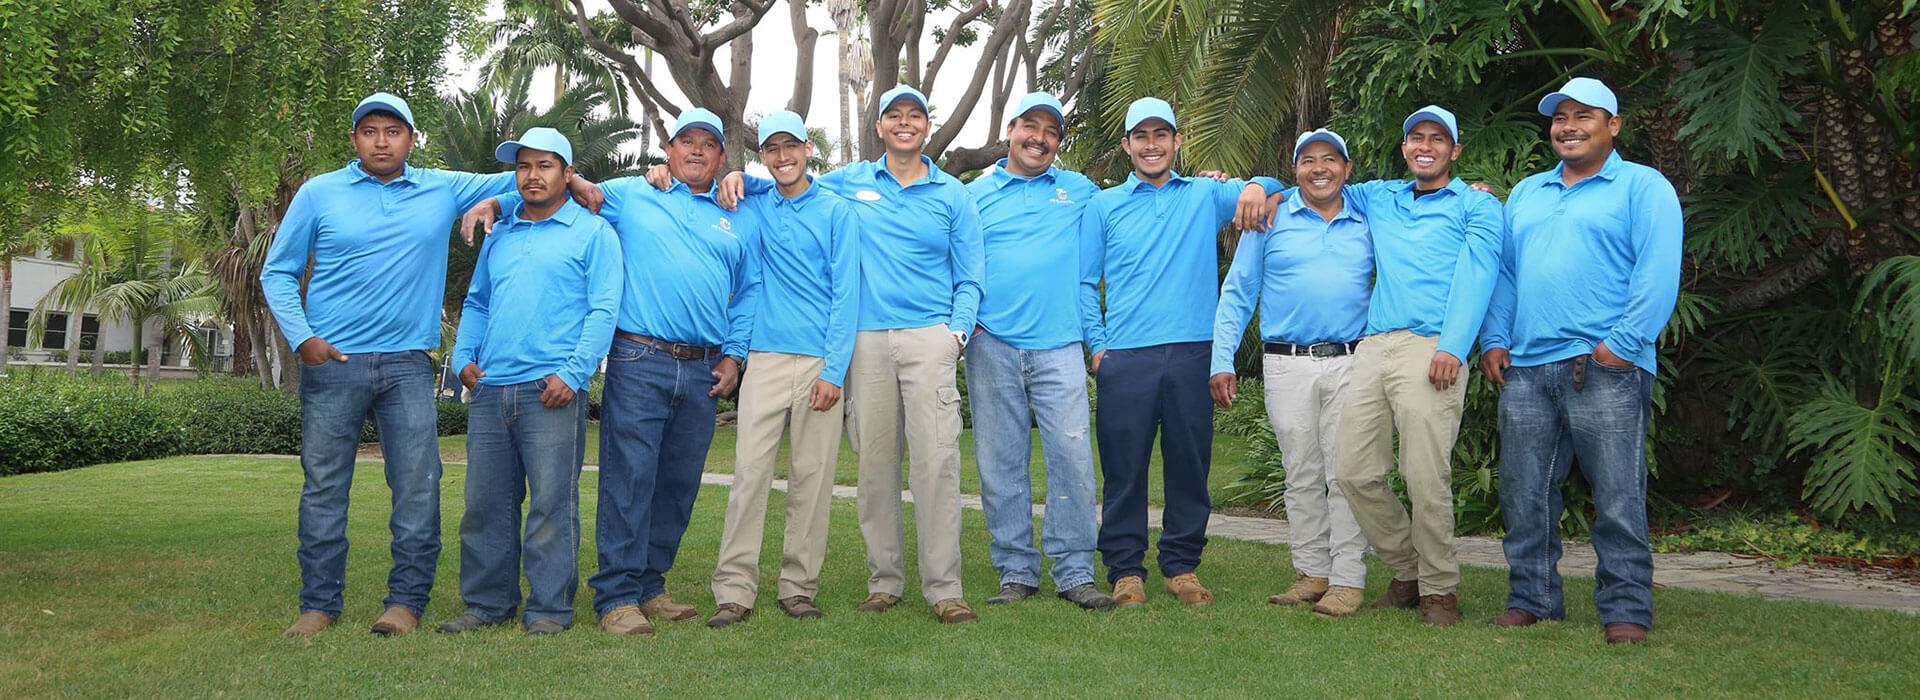 sbevolutionlandscape Garden and Landscaping Experts in Santa Barbara